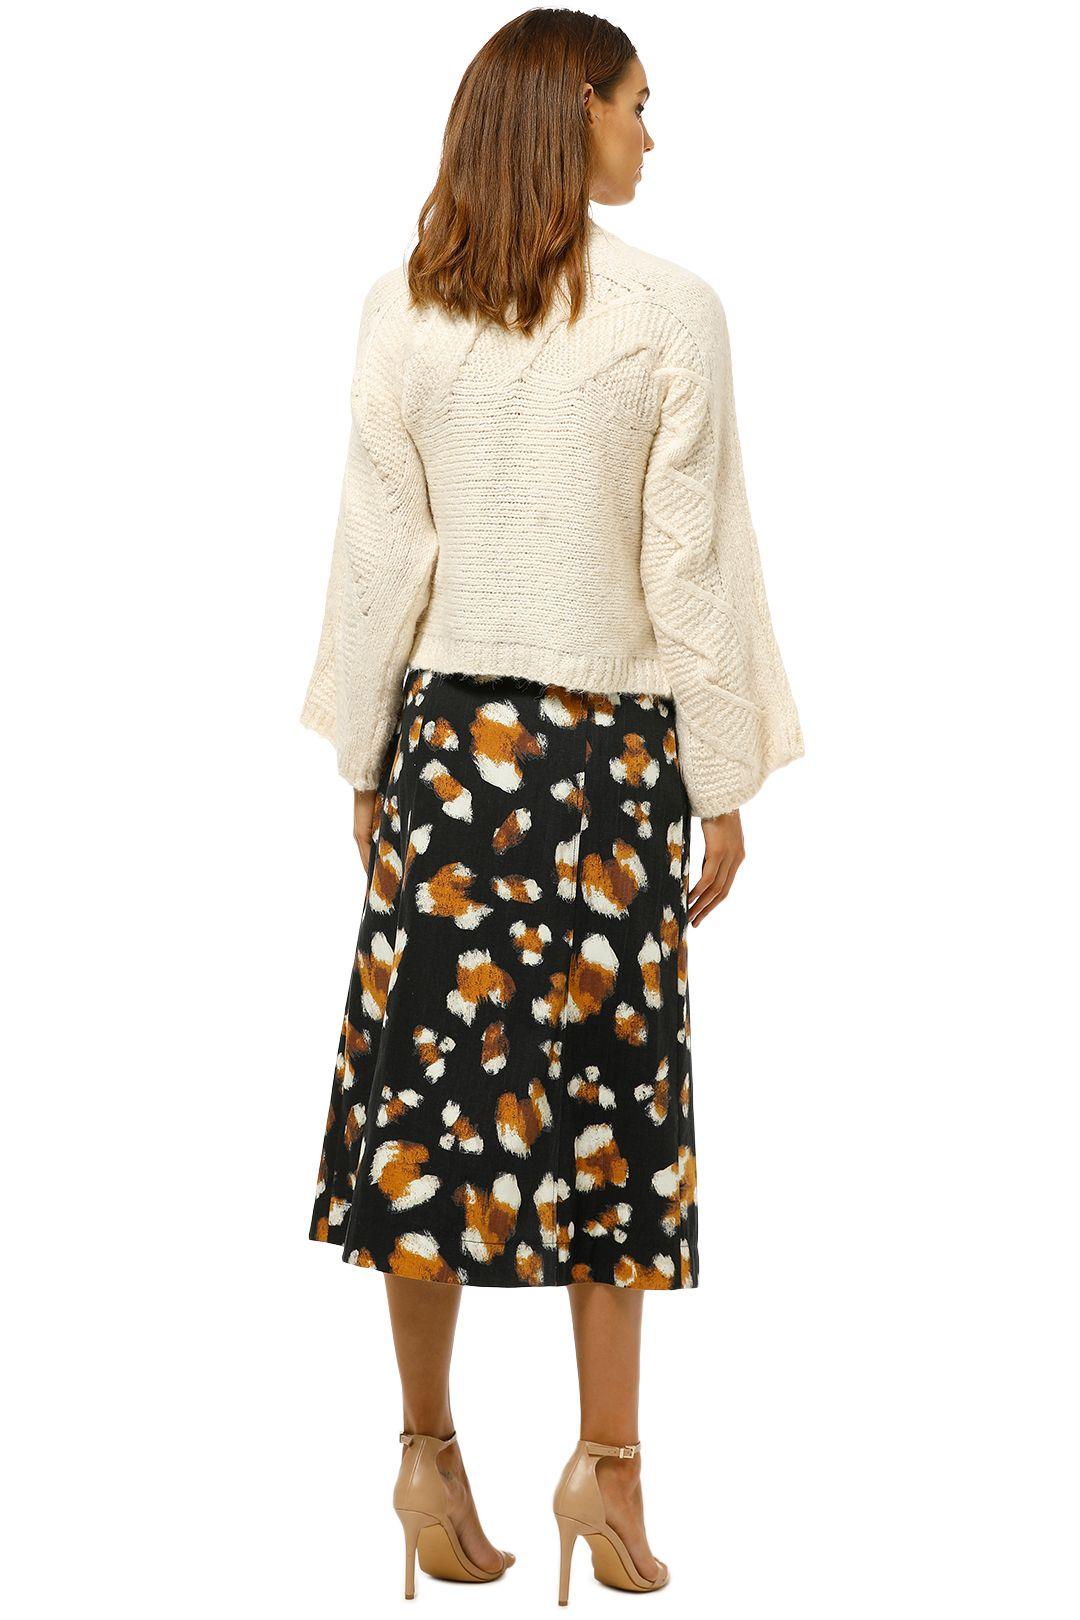 MNG-Contrasting-Knit-Sweater-Ecru-Back